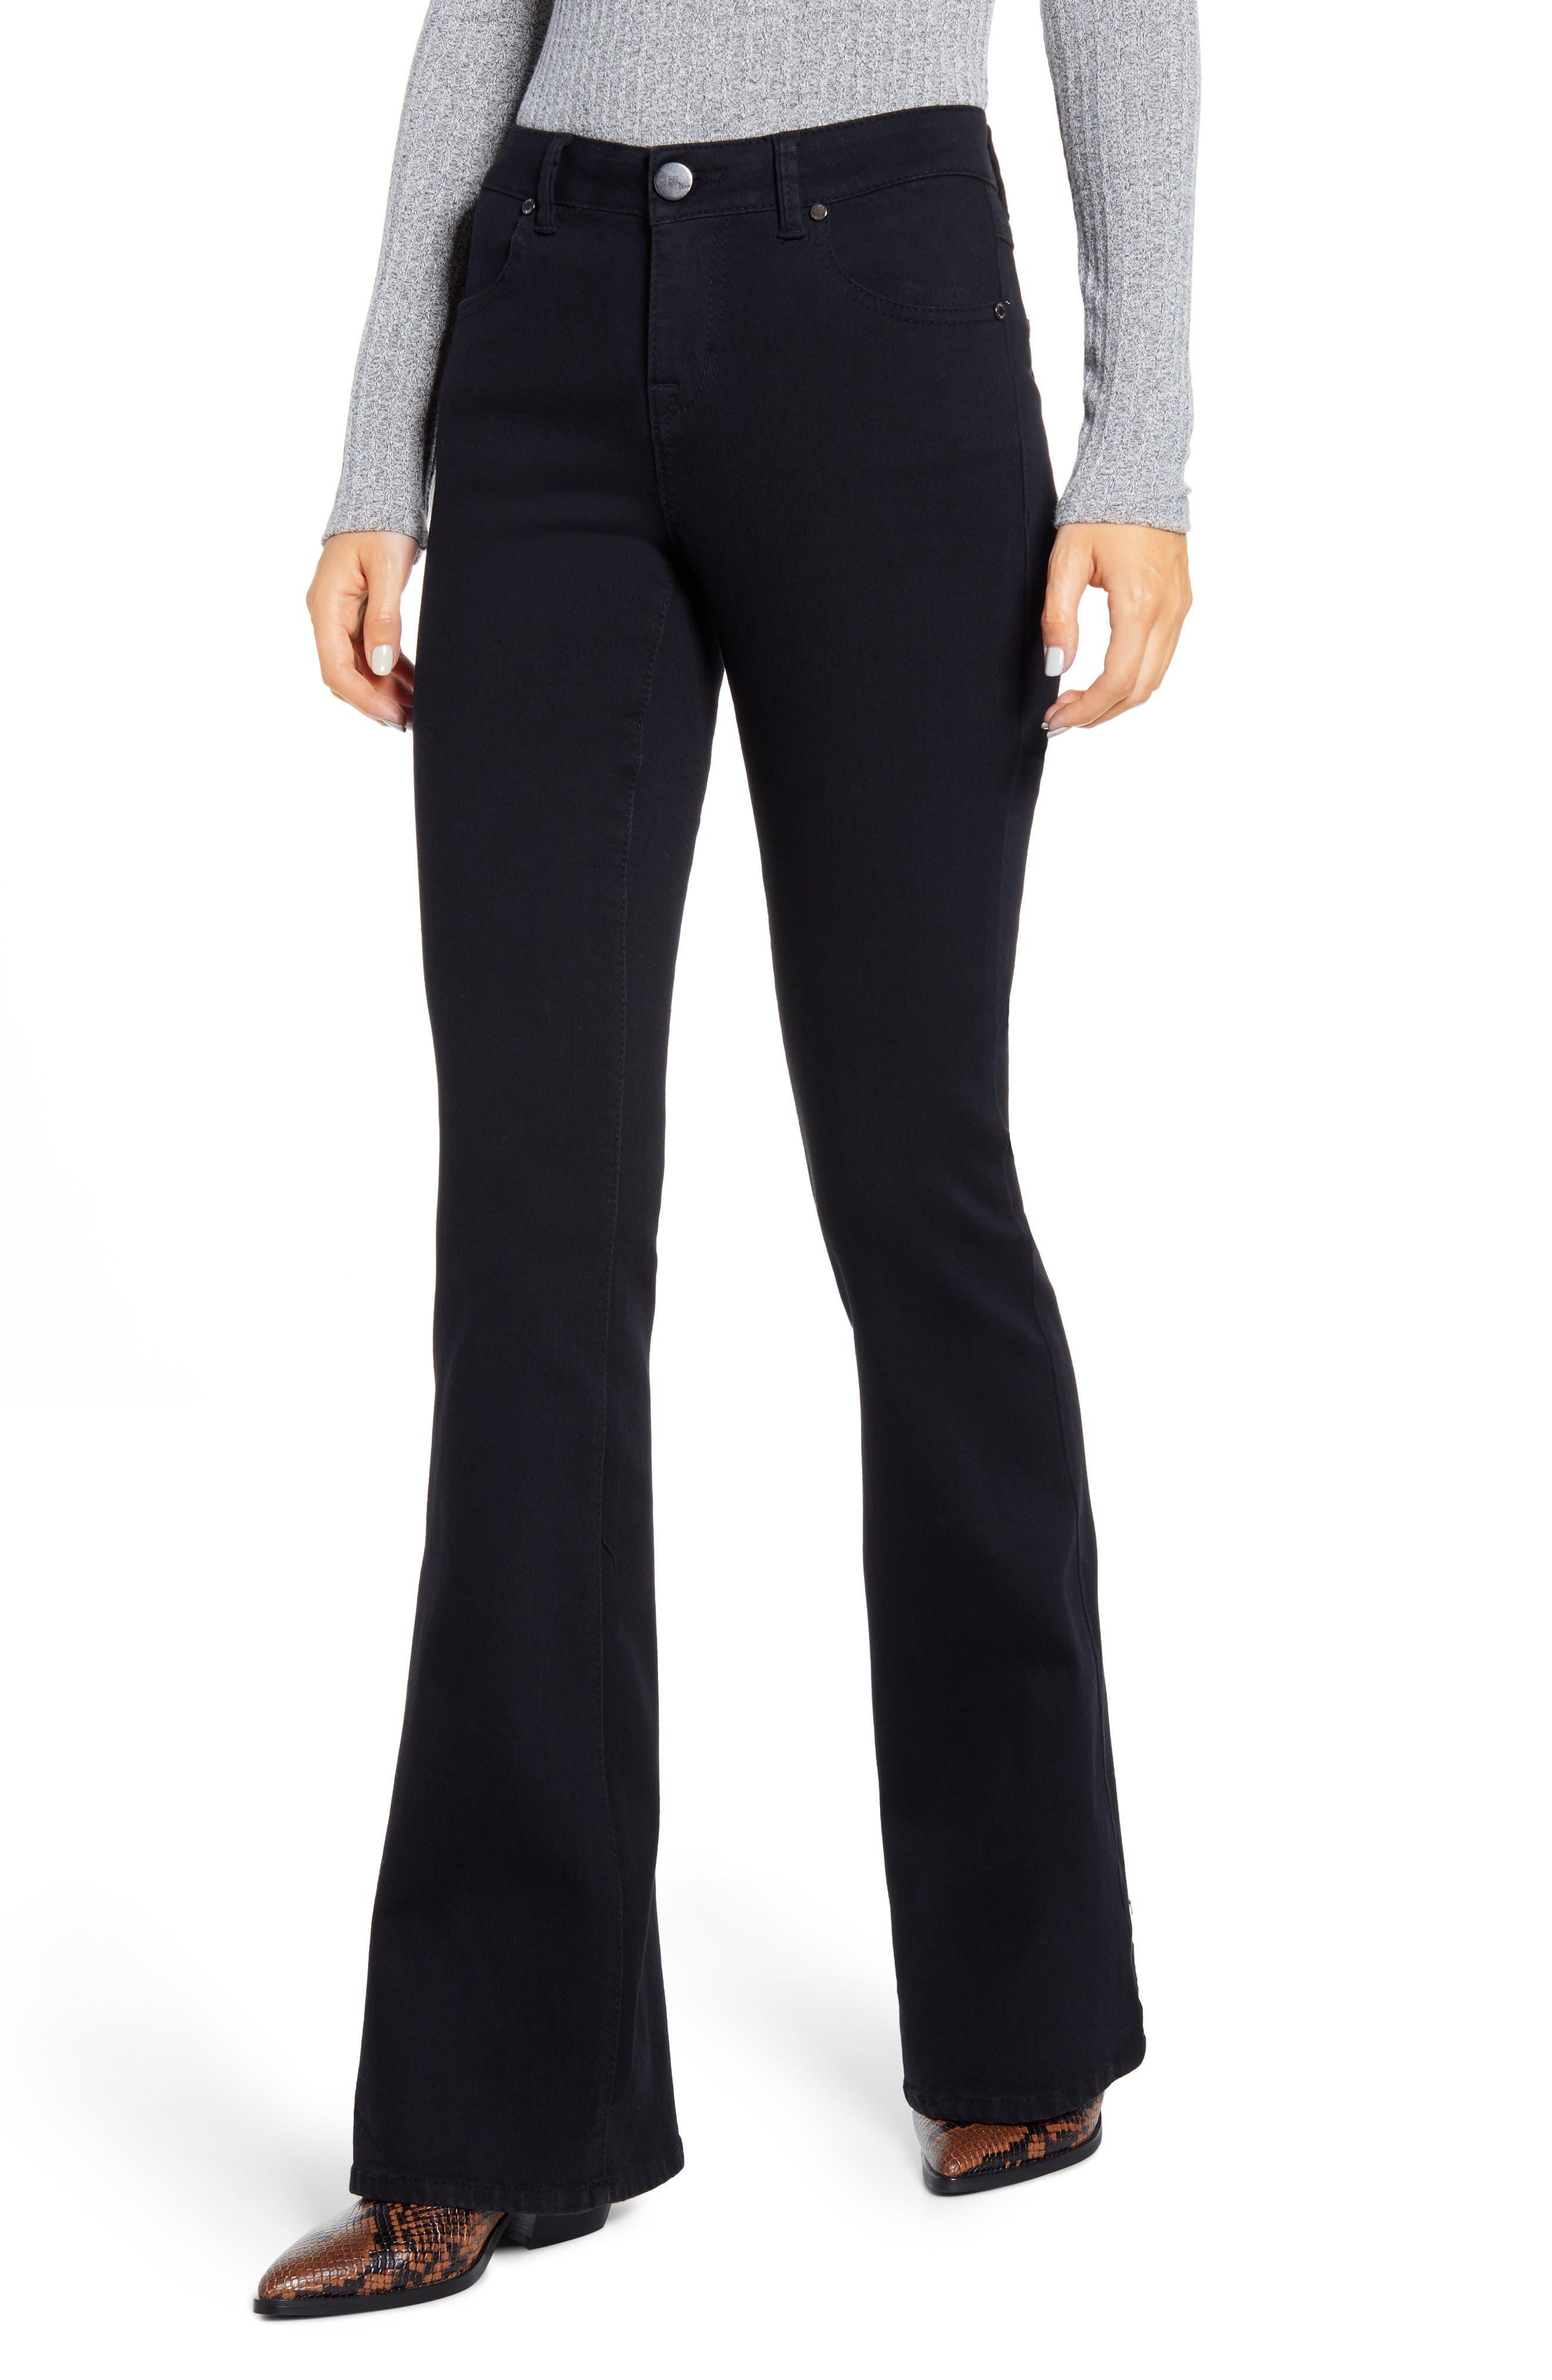 Women's 1822 Denim Flare Jeans